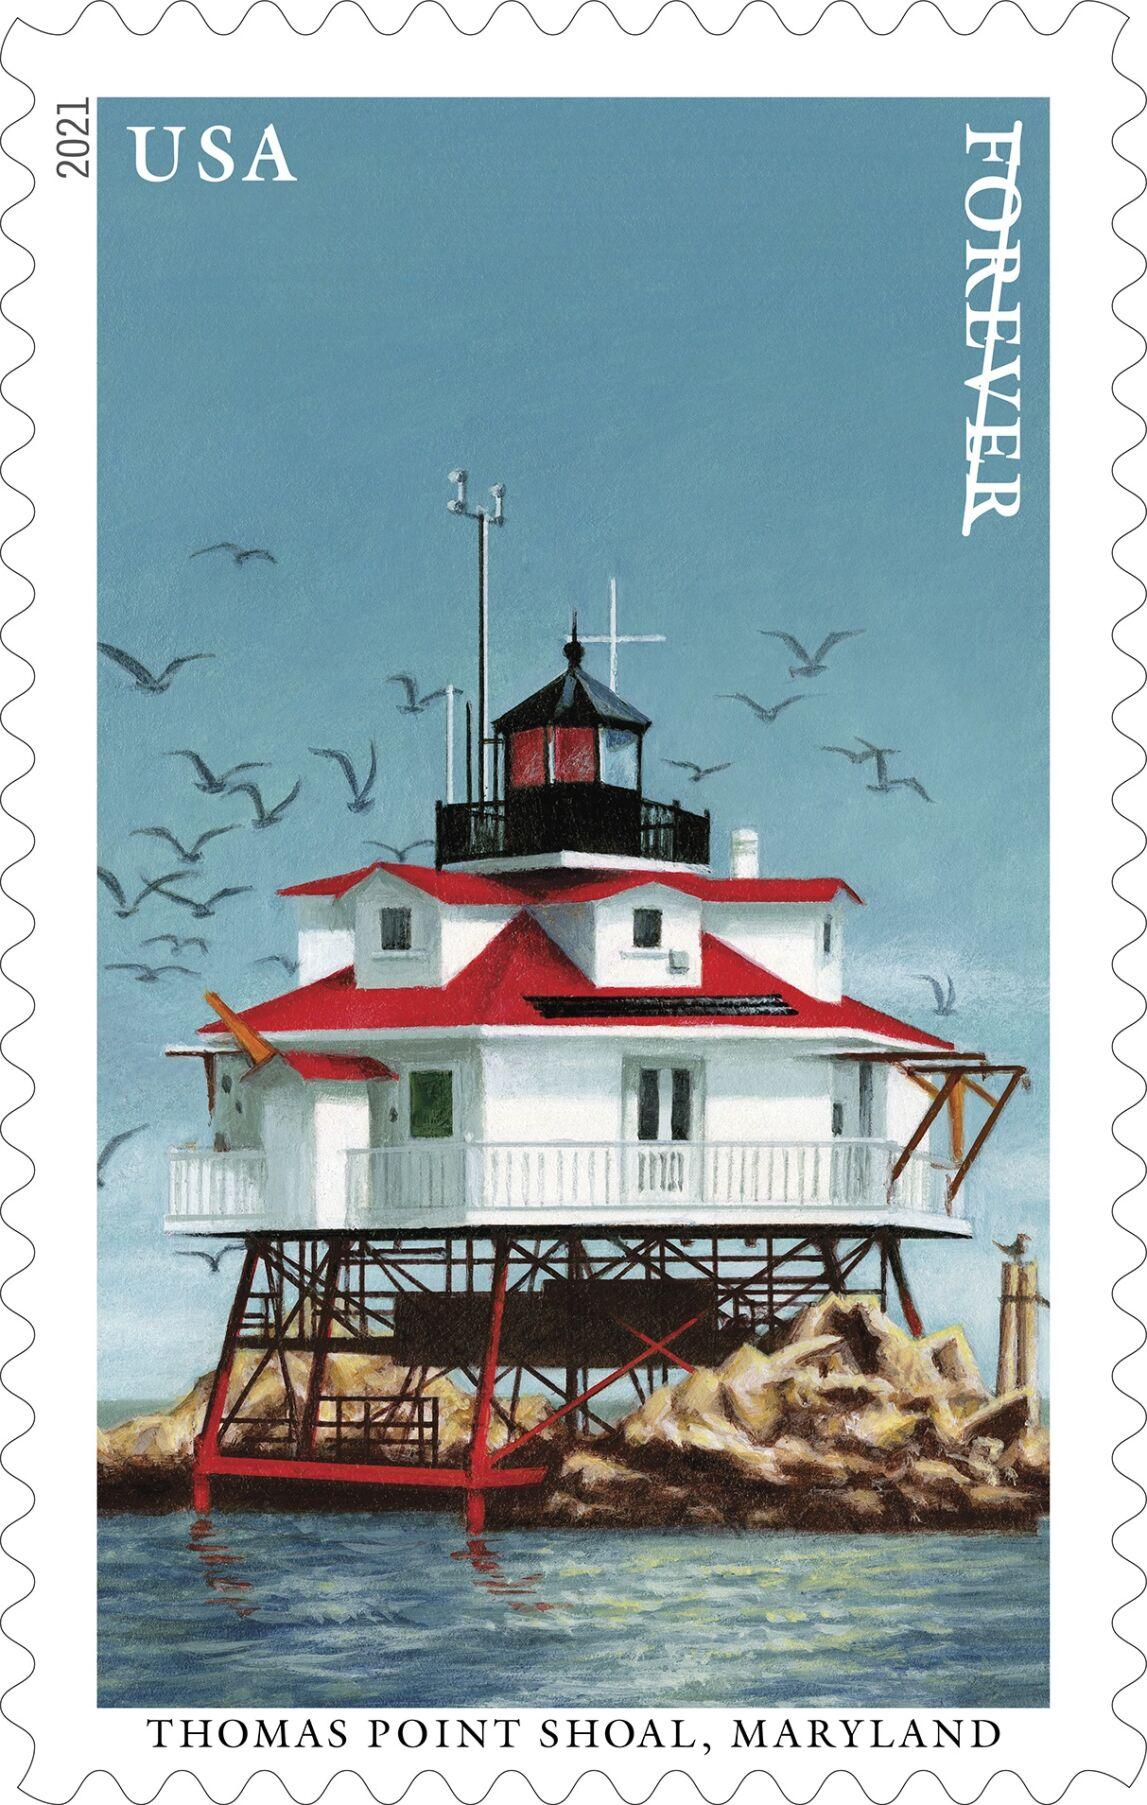 New Thomas Point Lighthouse Stamp via USPS